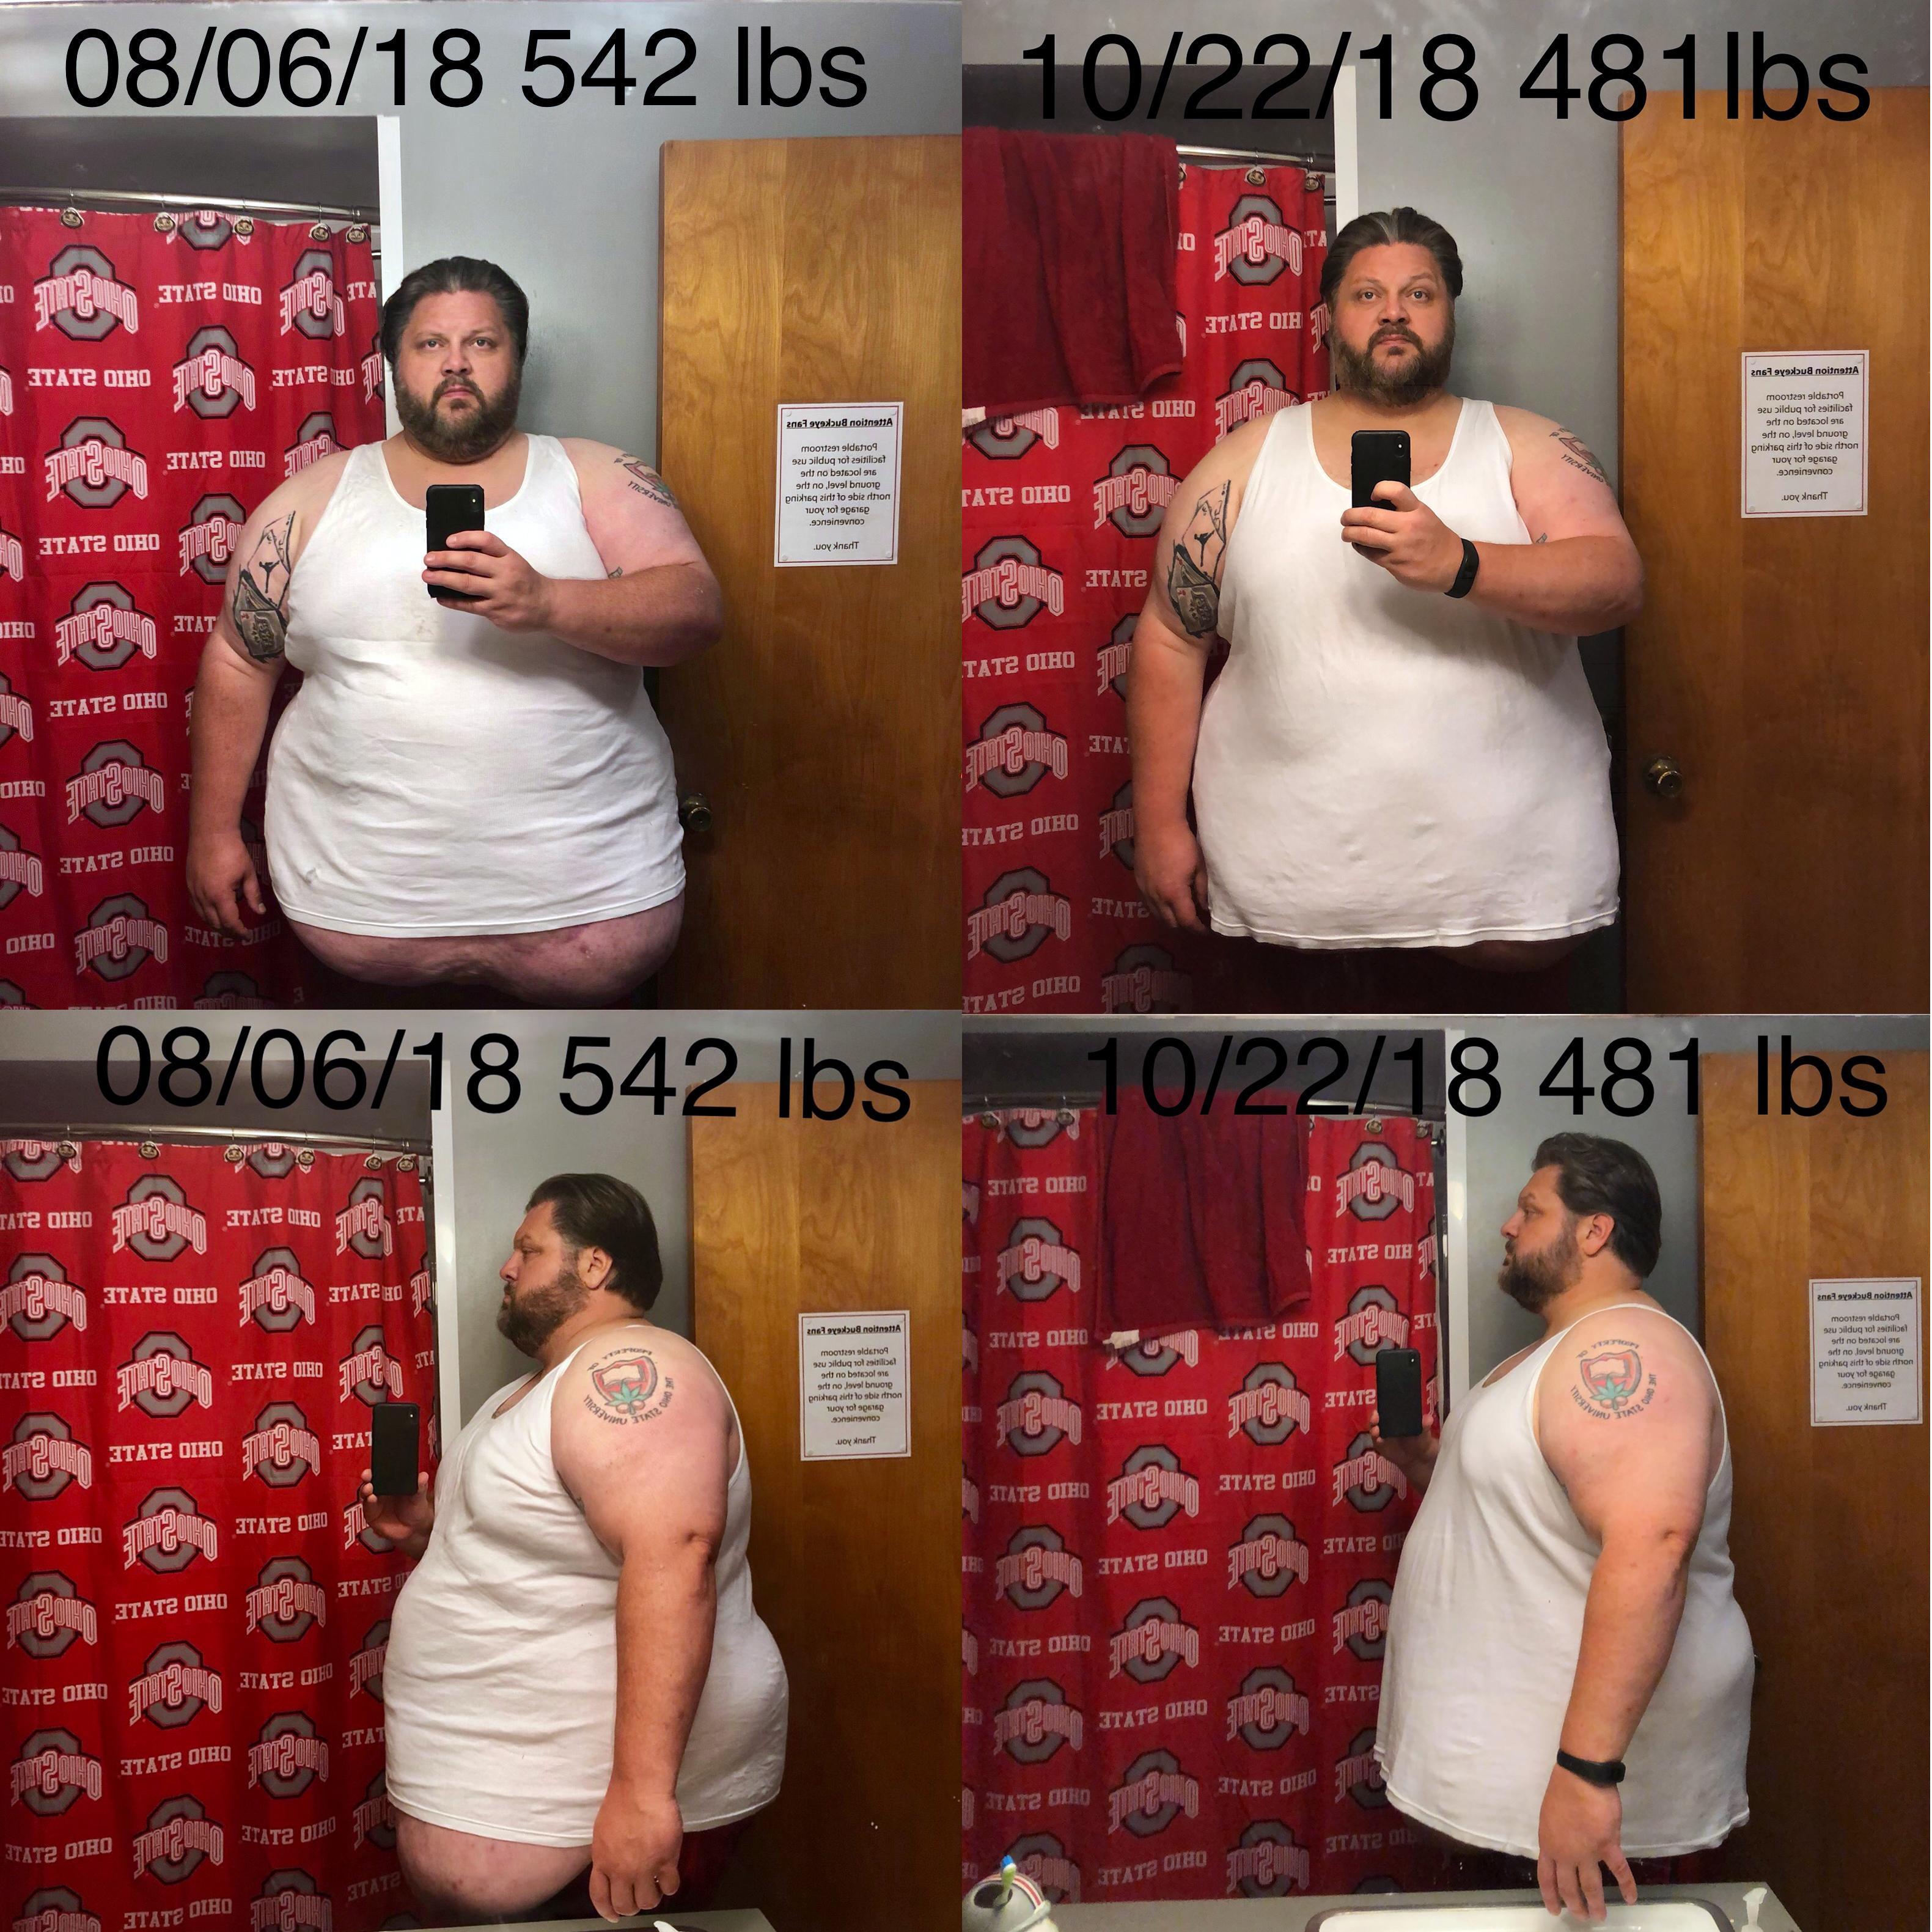 Progress Pics of 61 lbs Weight Loss 6 foot 1 Male 542 lbs to 481 lbs